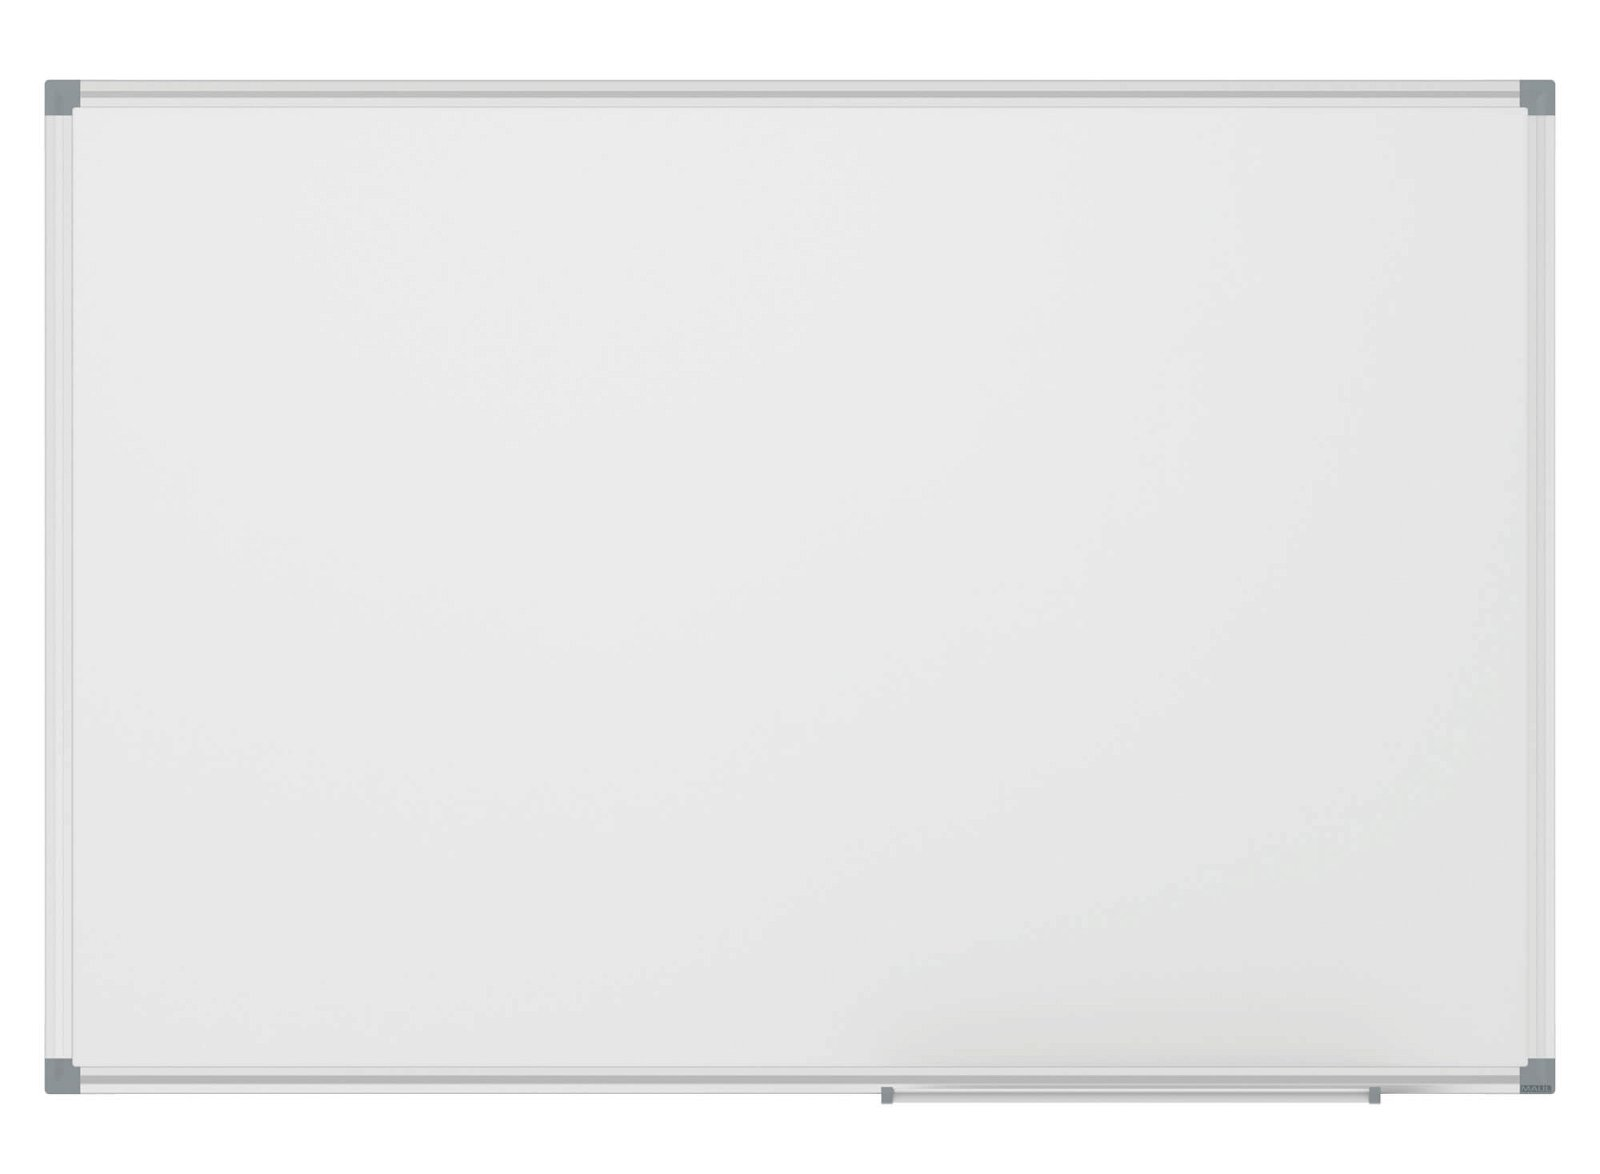 Whiteboard MAULstandard, 120x180 cm, grau